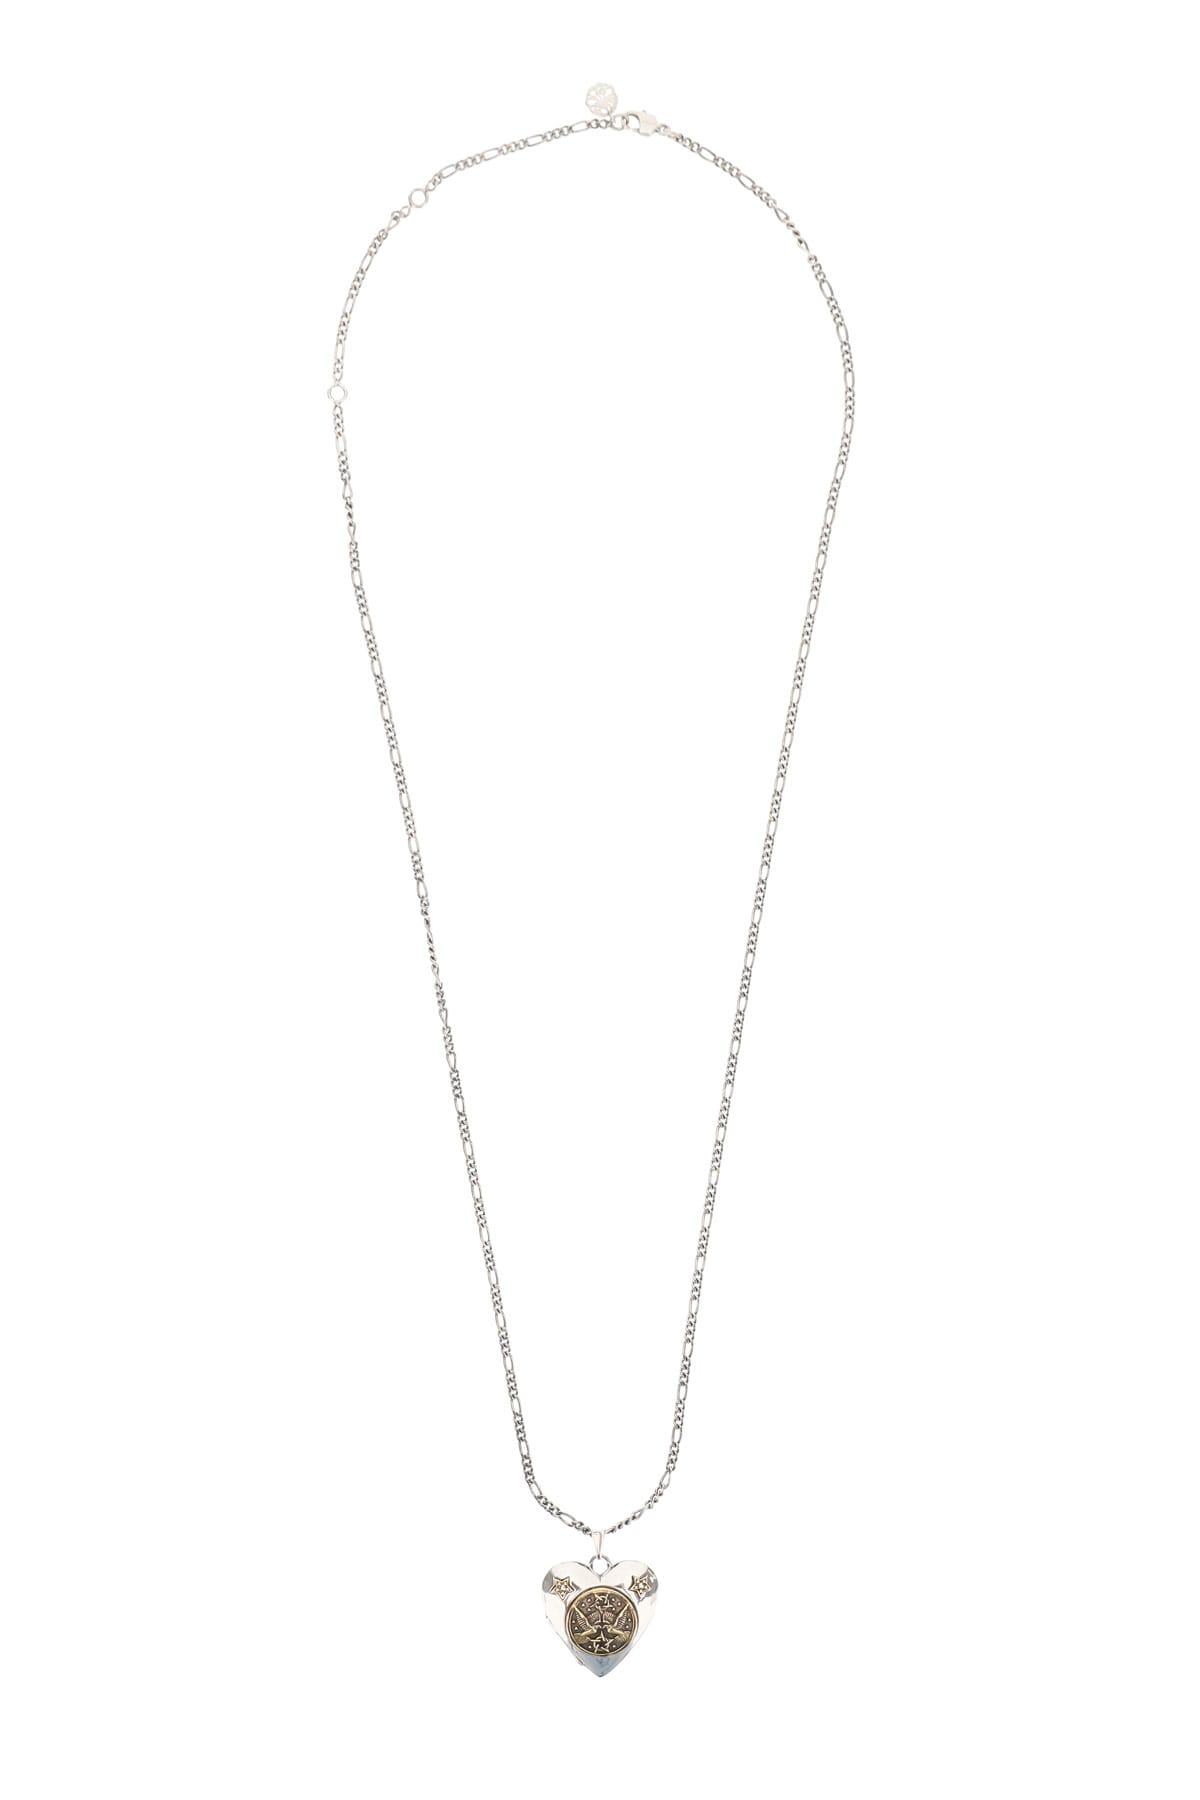 Alexander McQueen Long Necklace Heart With Emblem